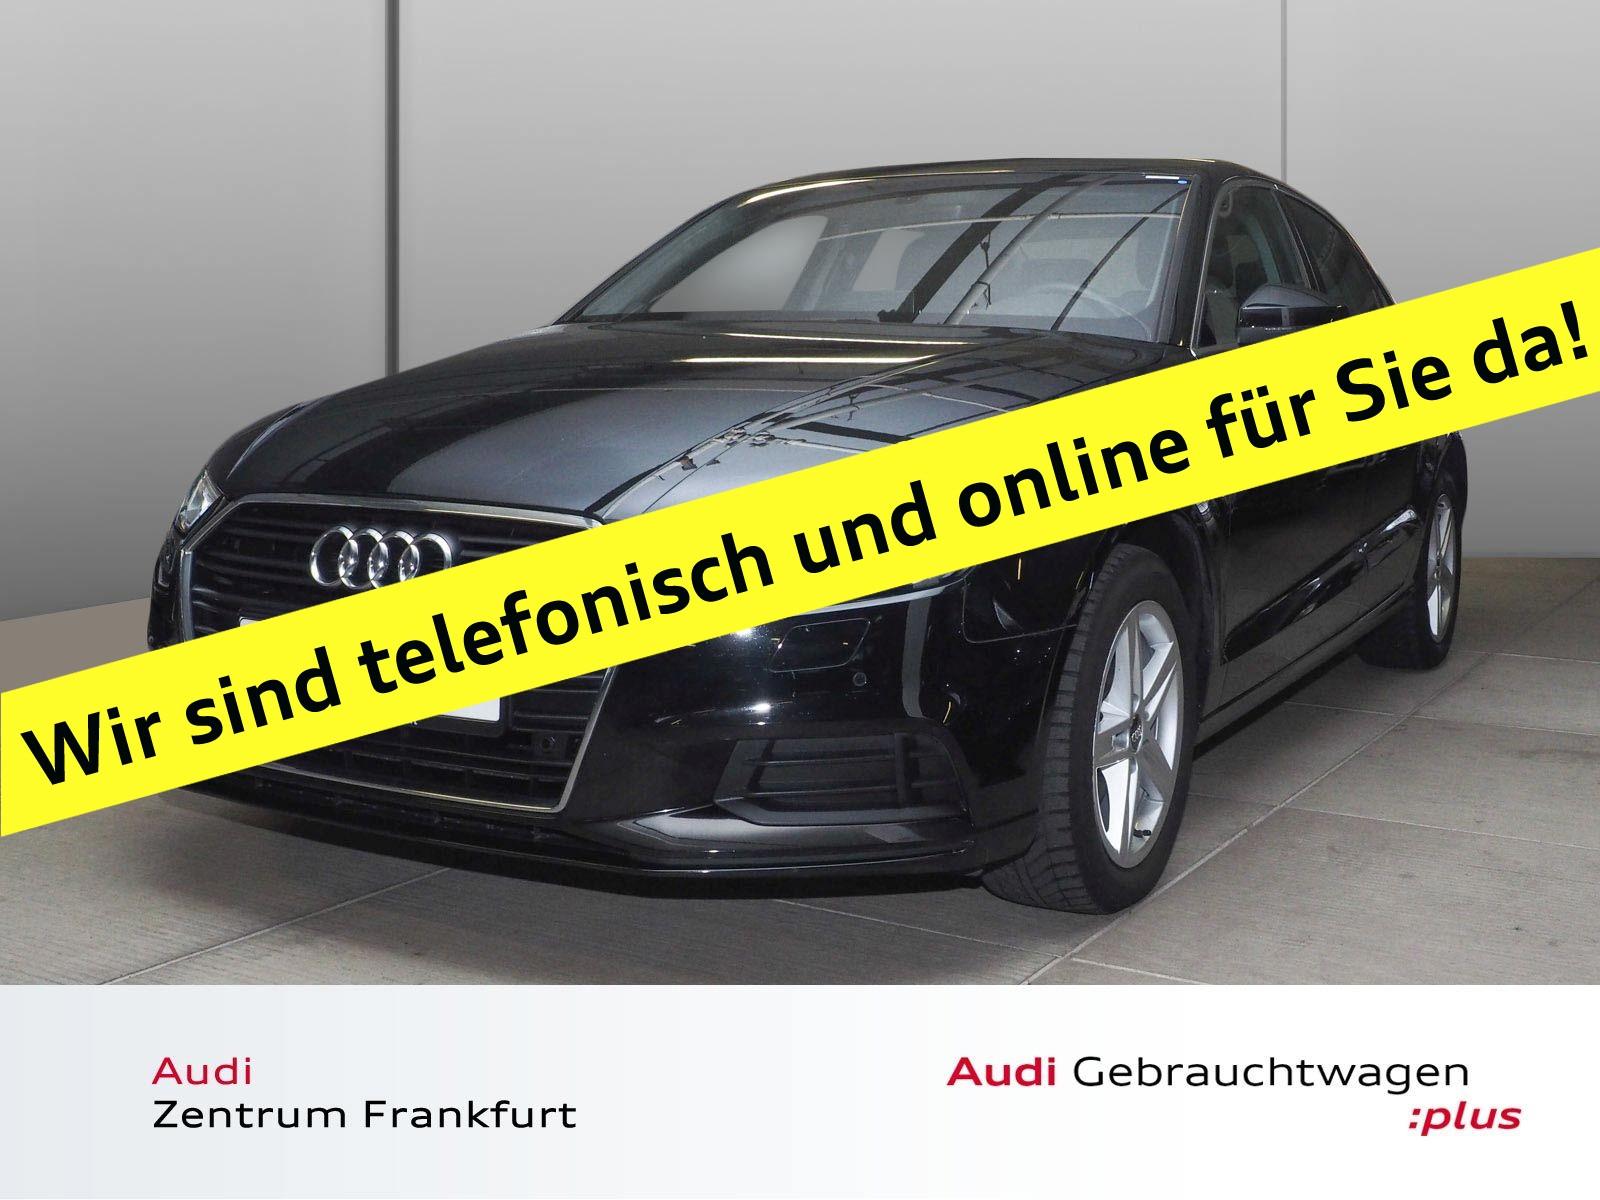 Audi A3 Limousine 1.5 TFSI Navi Xenon PDC Sitzheizung, Jahr 2017, Benzin